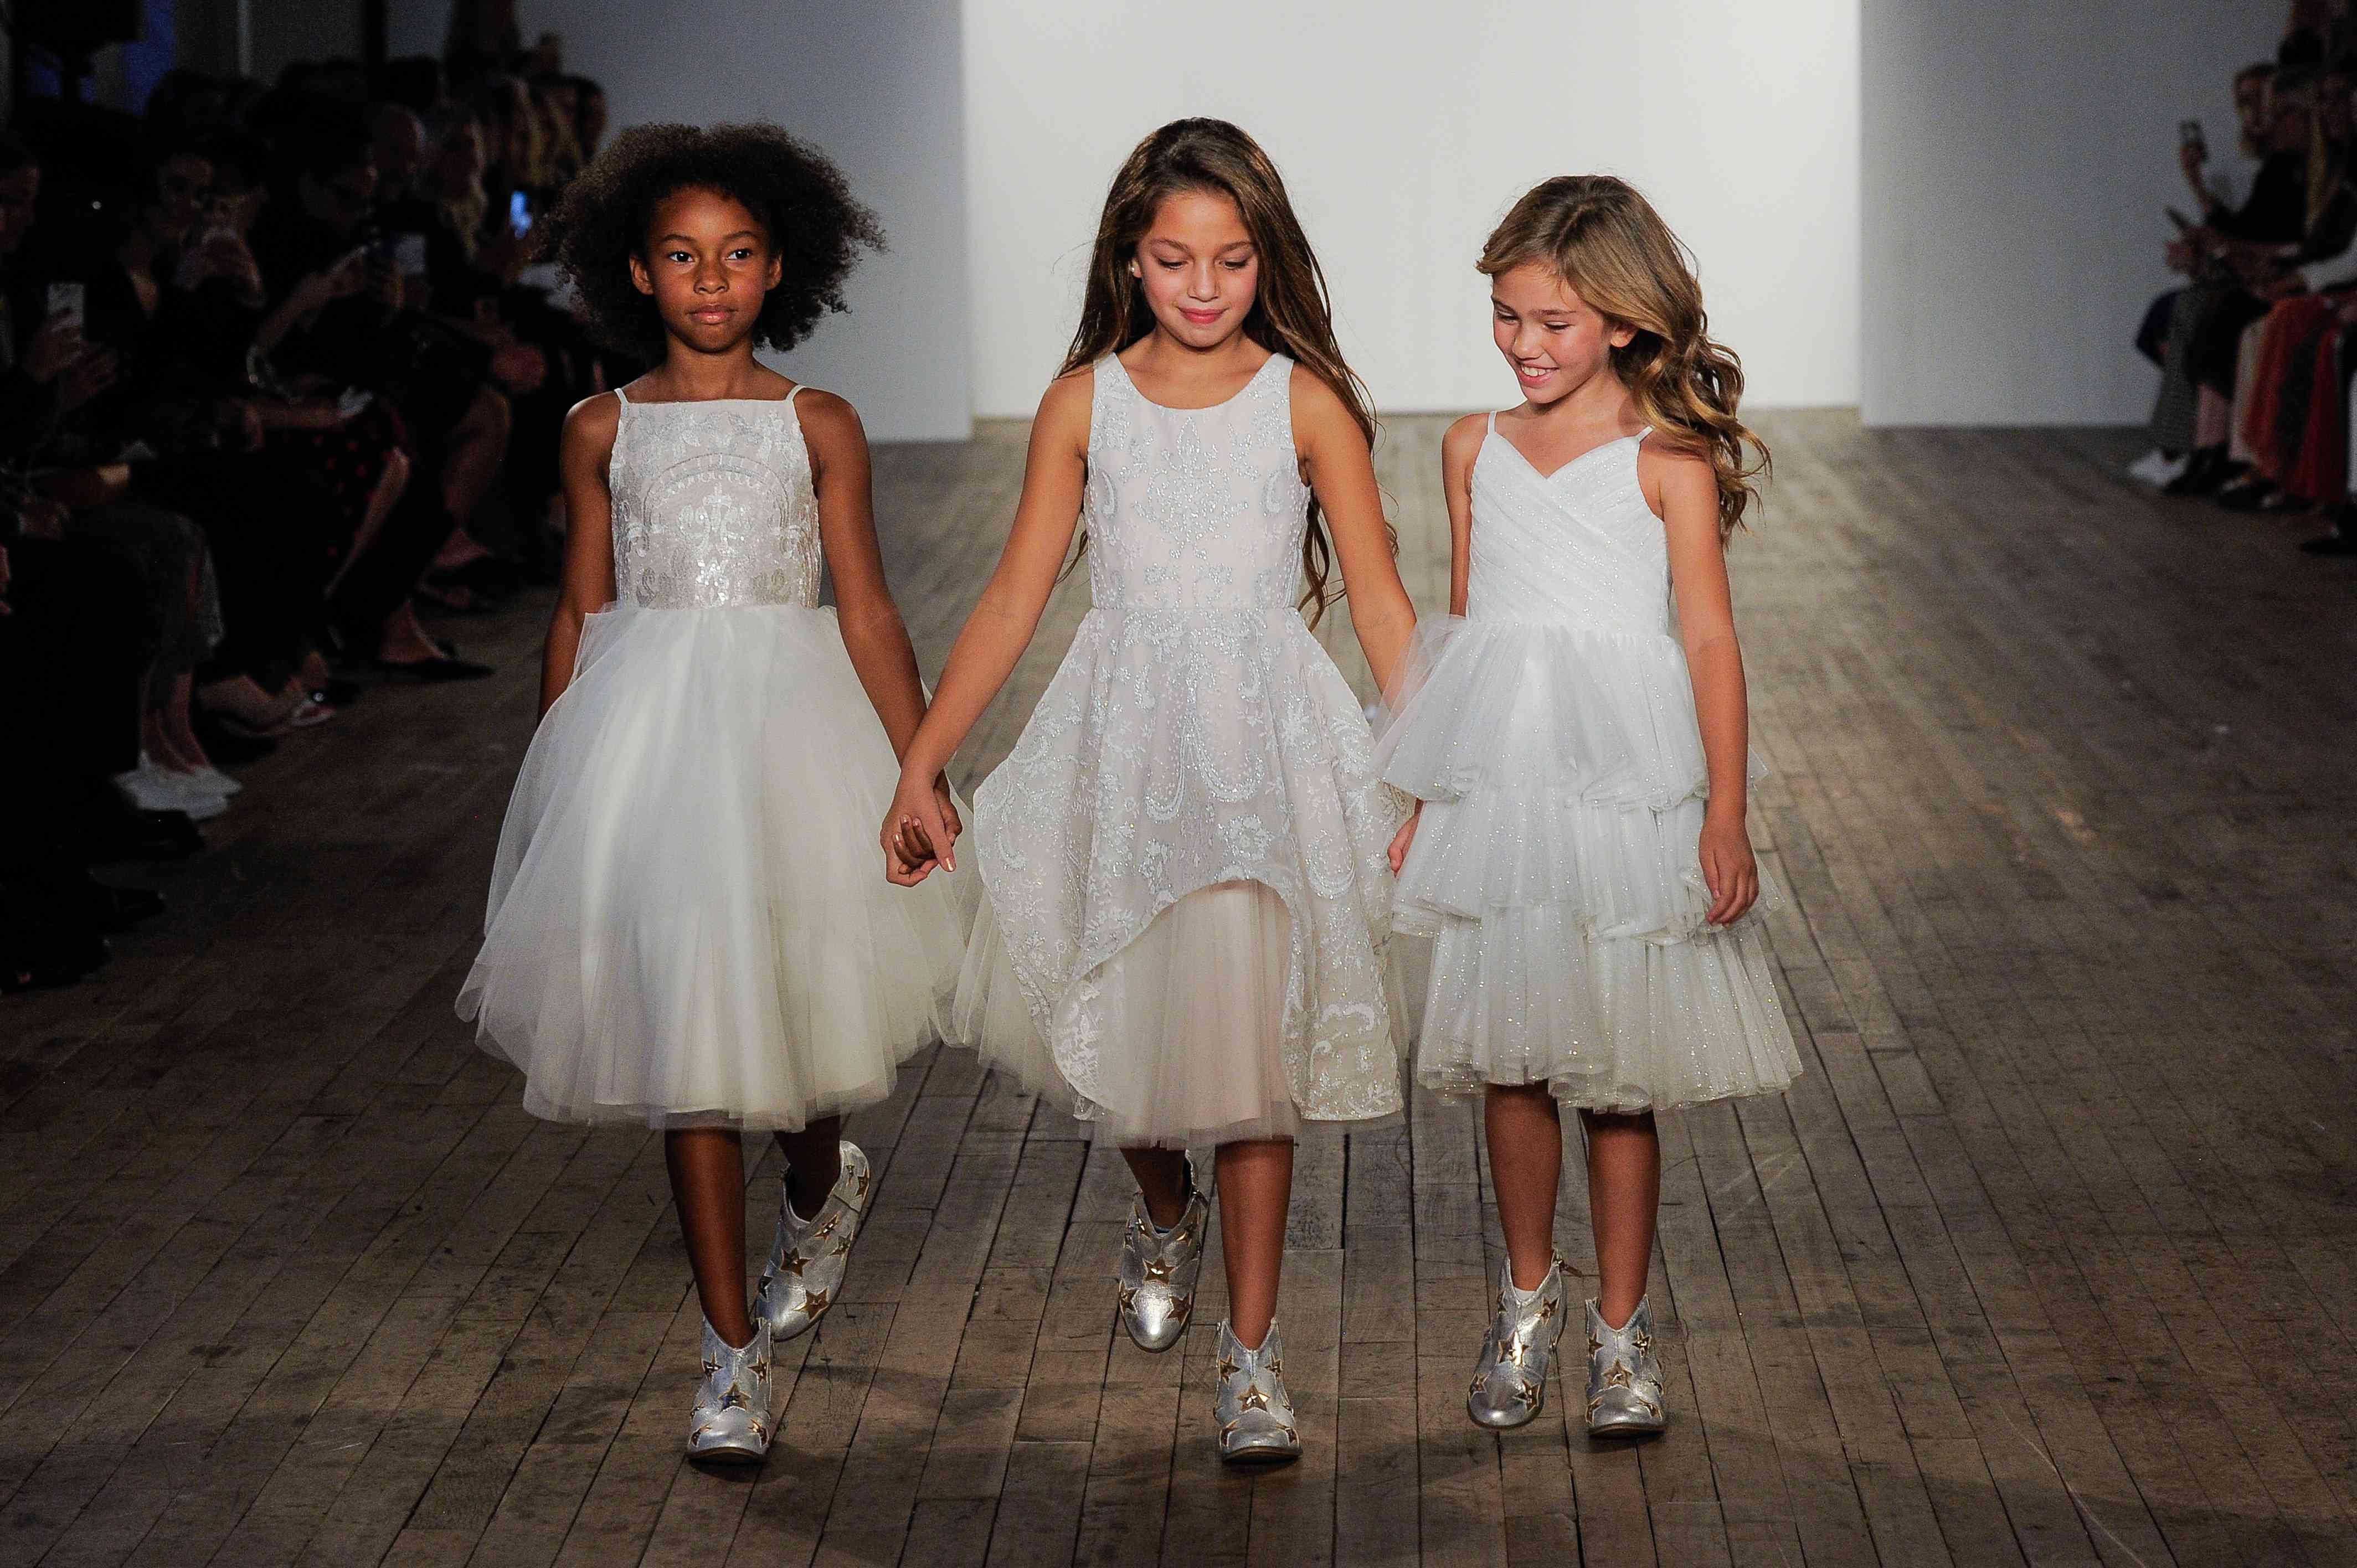 Dinah, Maven, and Della flower girl dresses